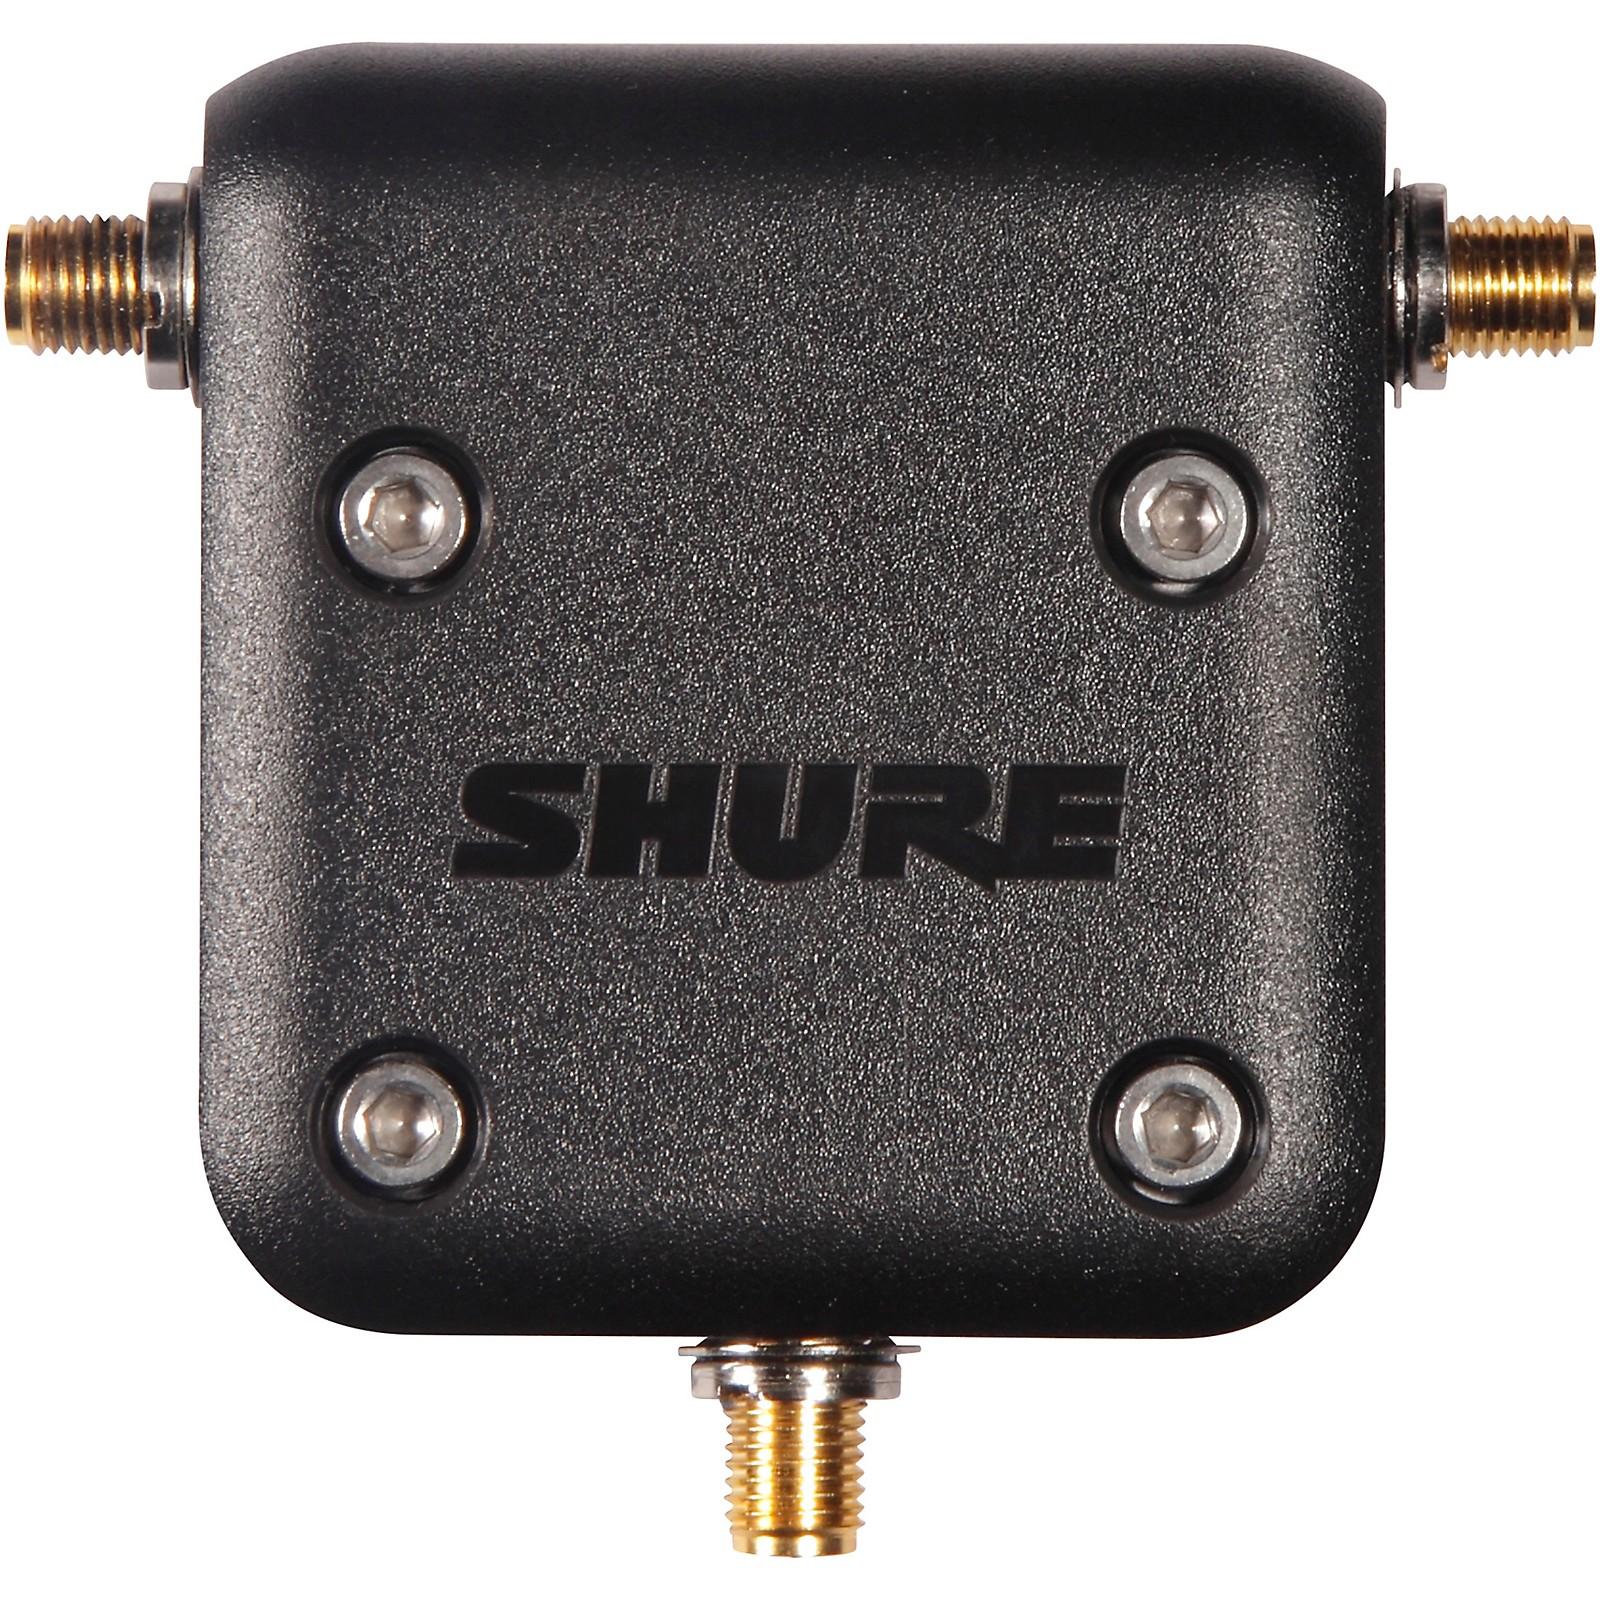 Open Box Shure UA221-RSMA Reverse SMA Passive Antenna Splitter